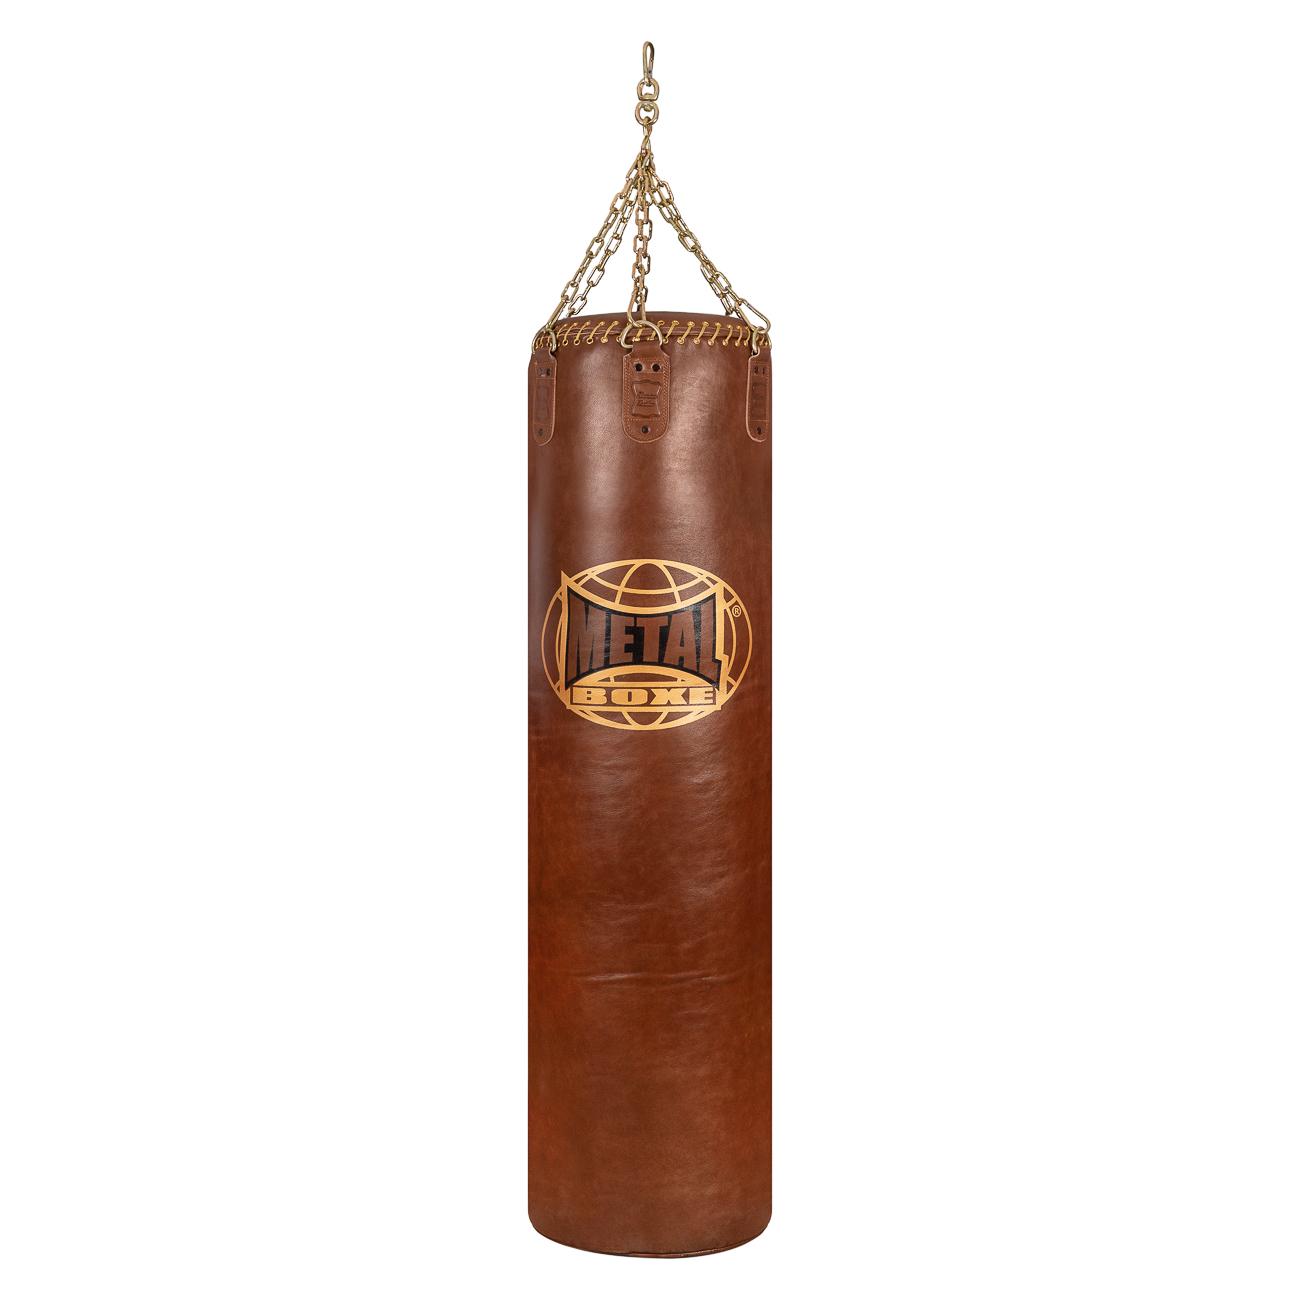 Sac de frappe en cuir Métal boxe Jupiter 65 kilos